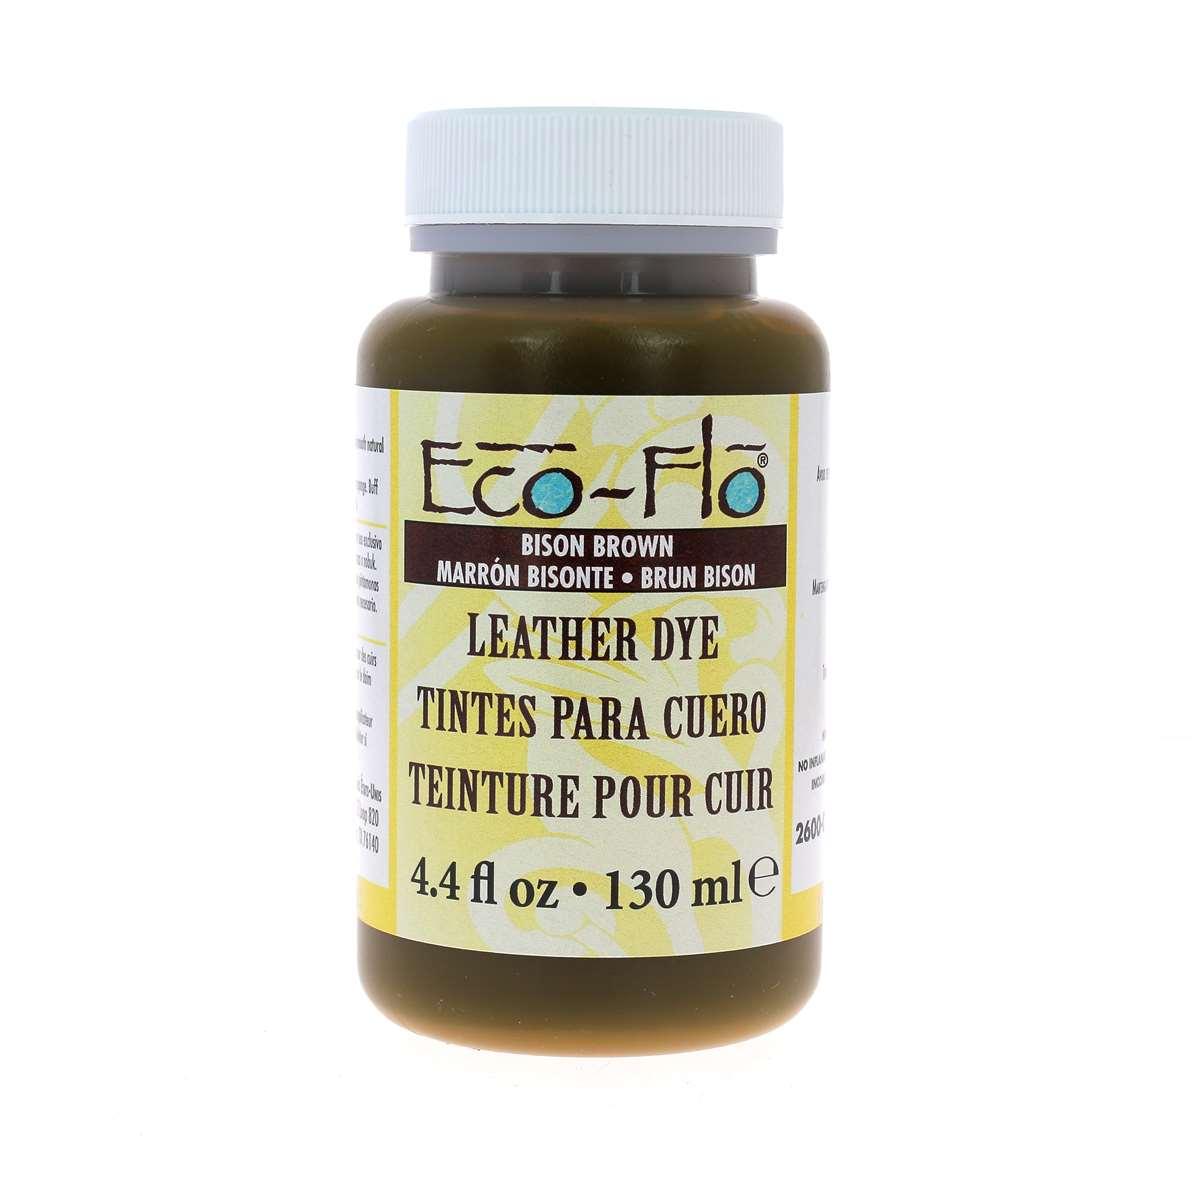 Teinture base aqueuse - Eco-Flo - 130ml